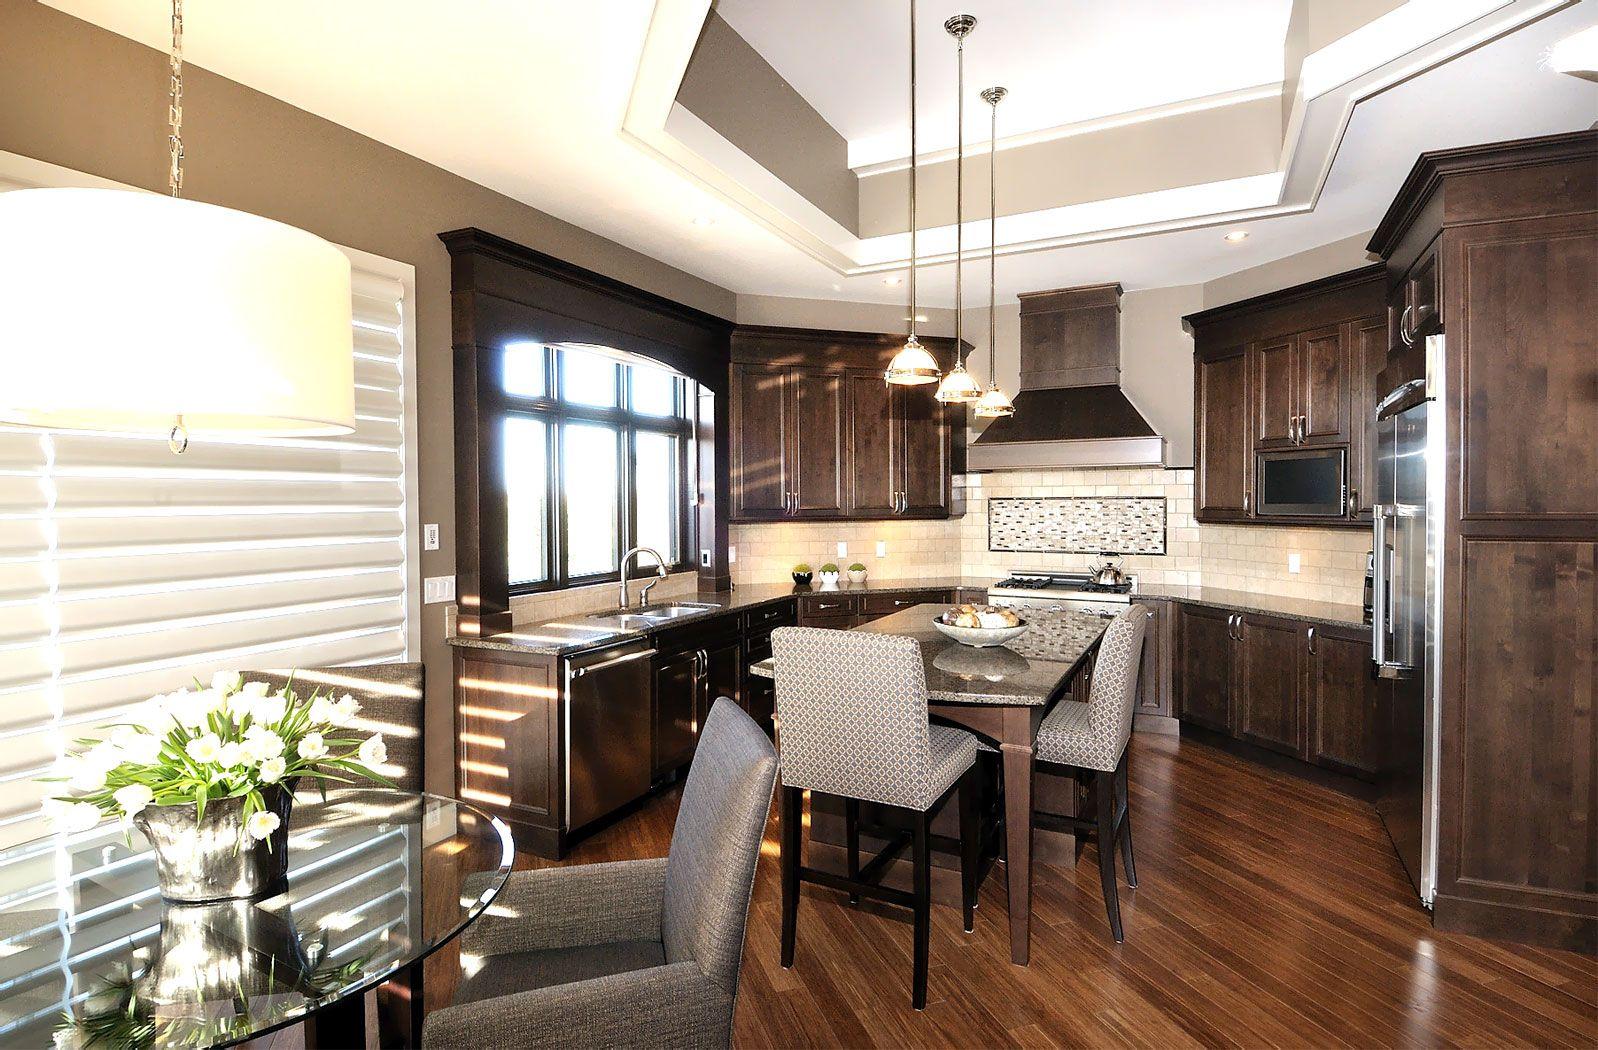 Atmosphere interior design saskatoon home decor that i